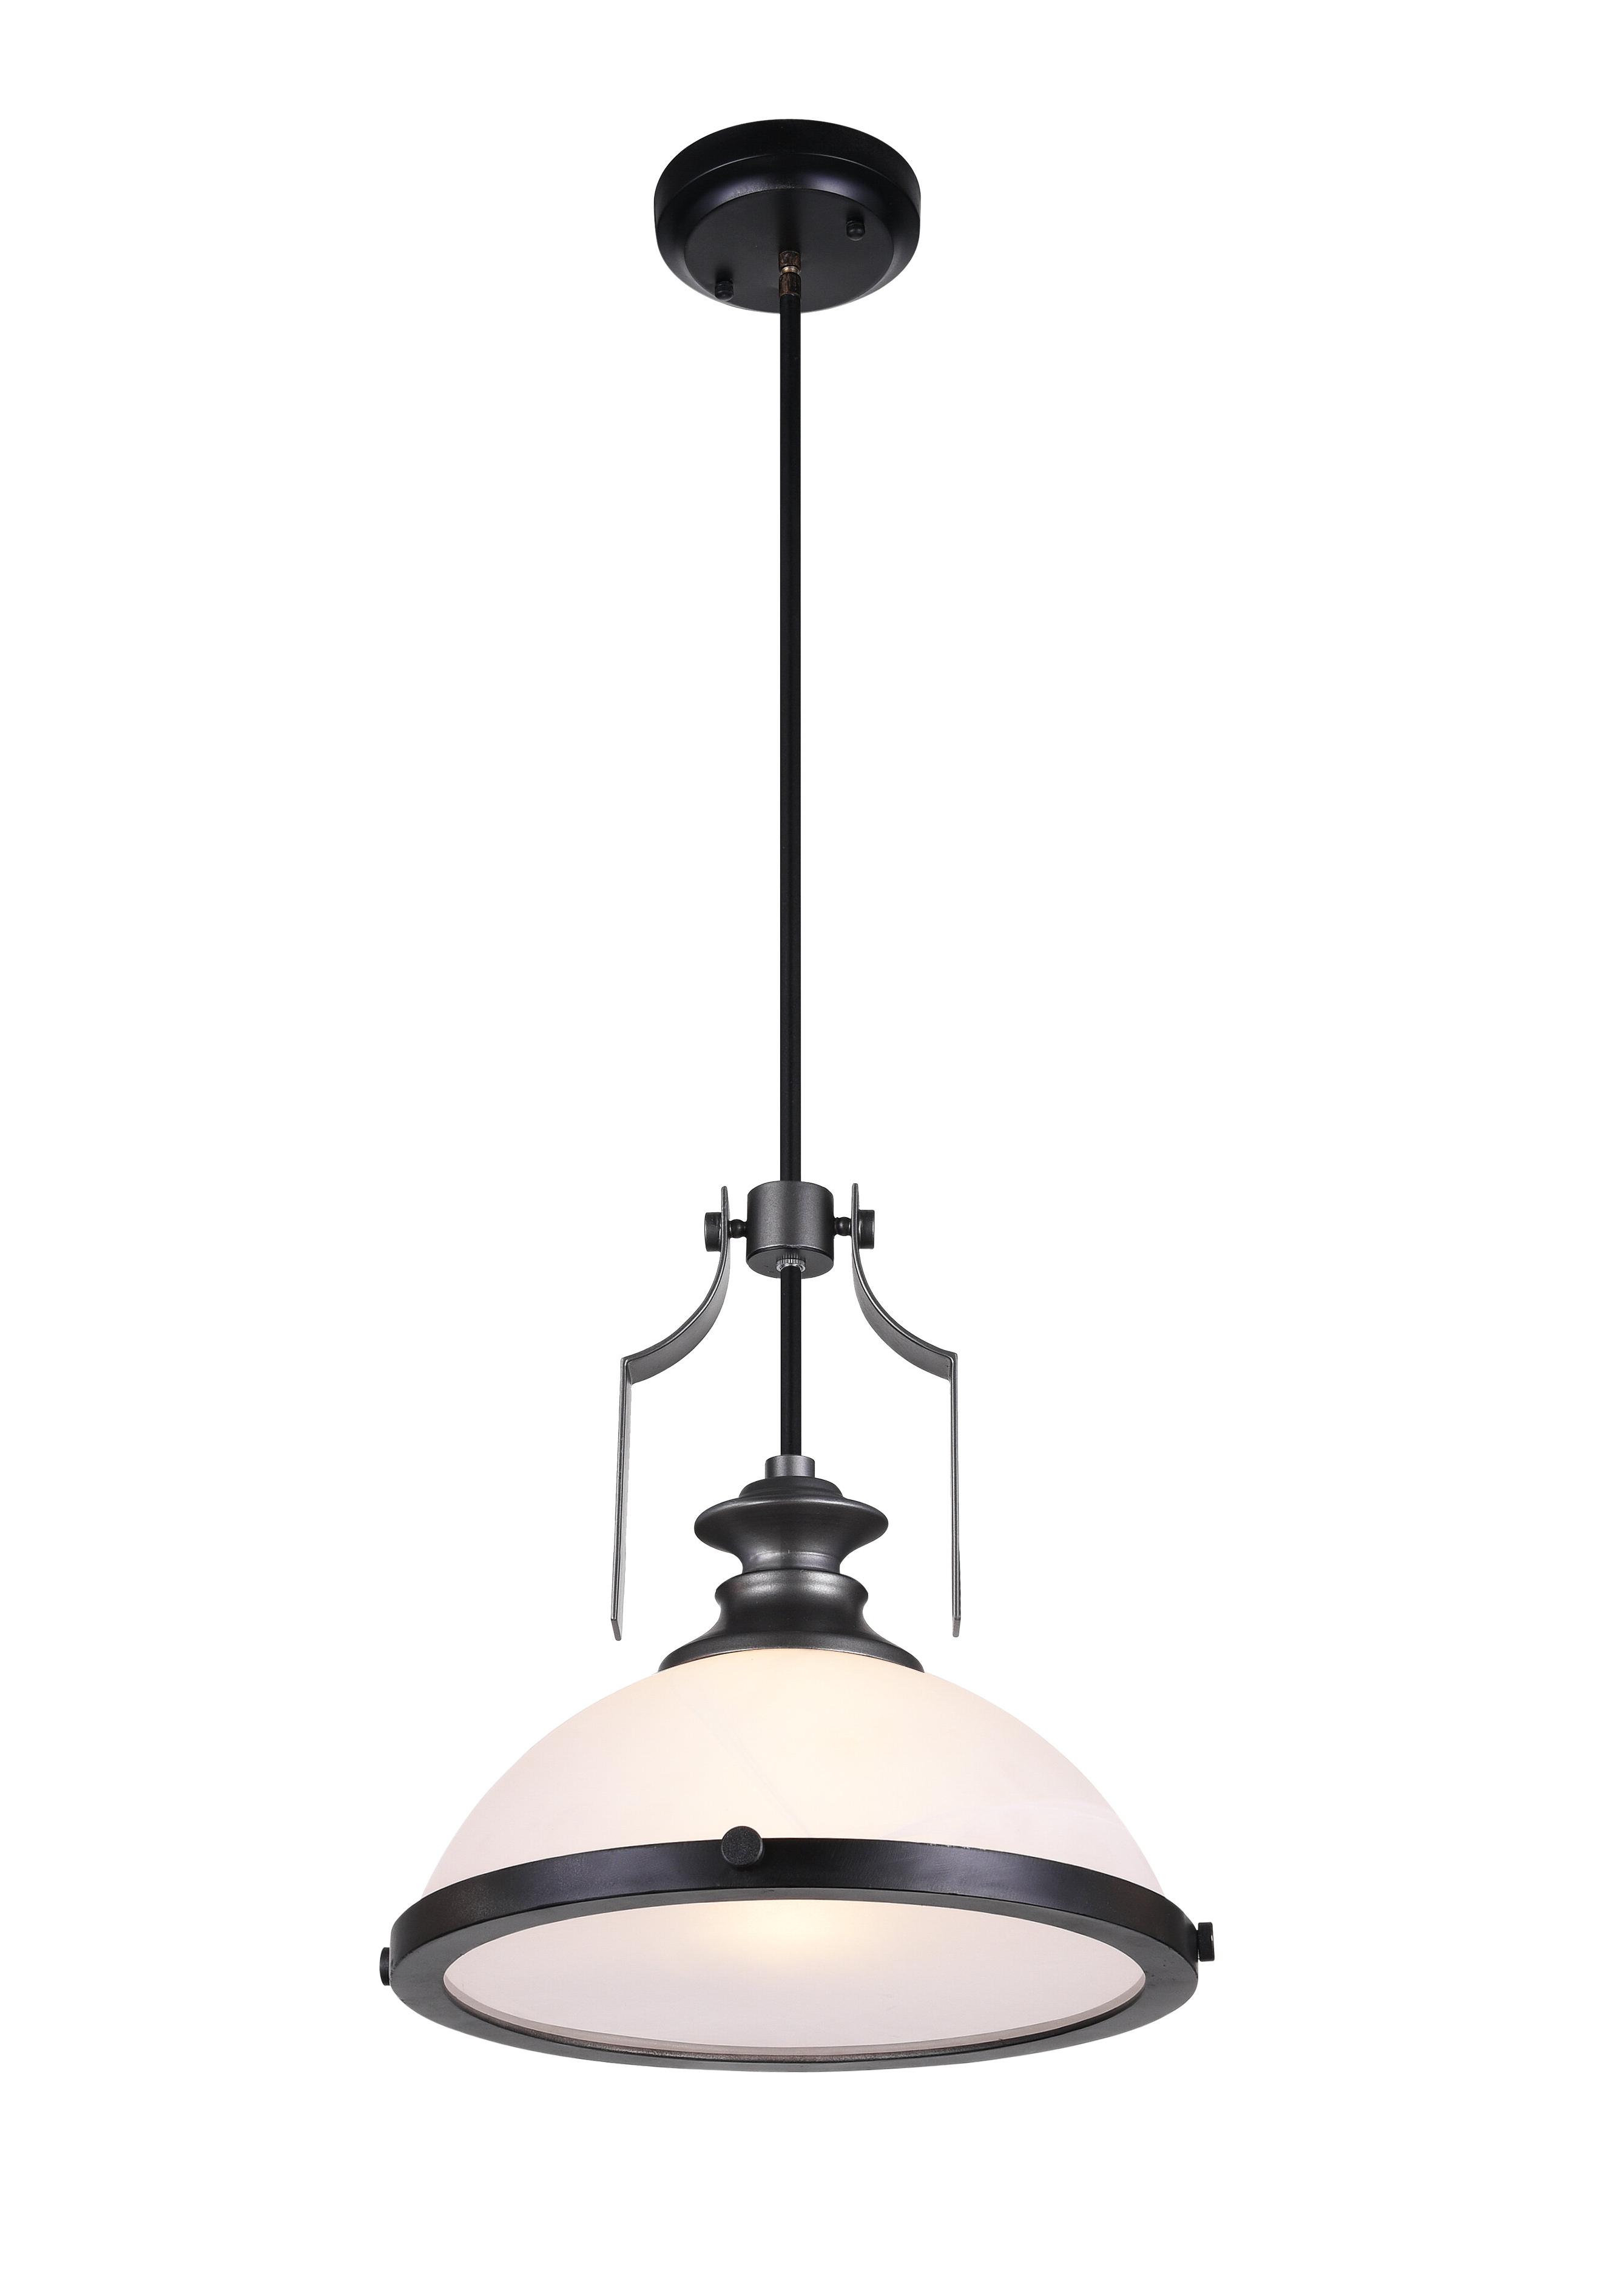 Terry 1 Light Single Bell Pendants In Preferred Detti 1 Light Dome Pendant (View 14 of 20)